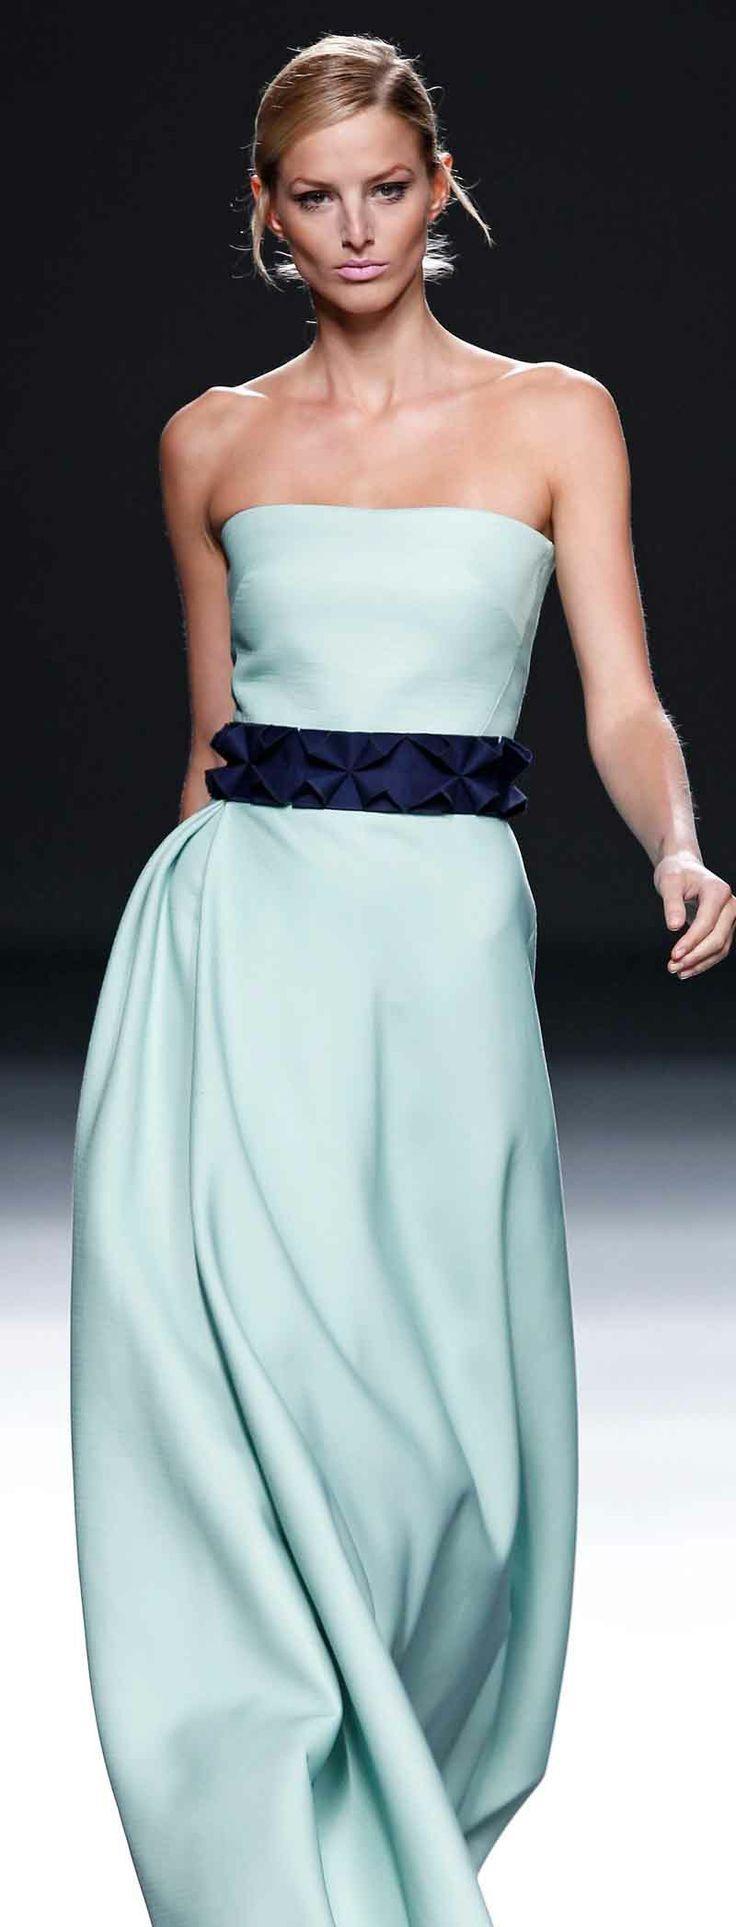 290 best DRESS images on Pinterest | Party dresses, Clothing ...